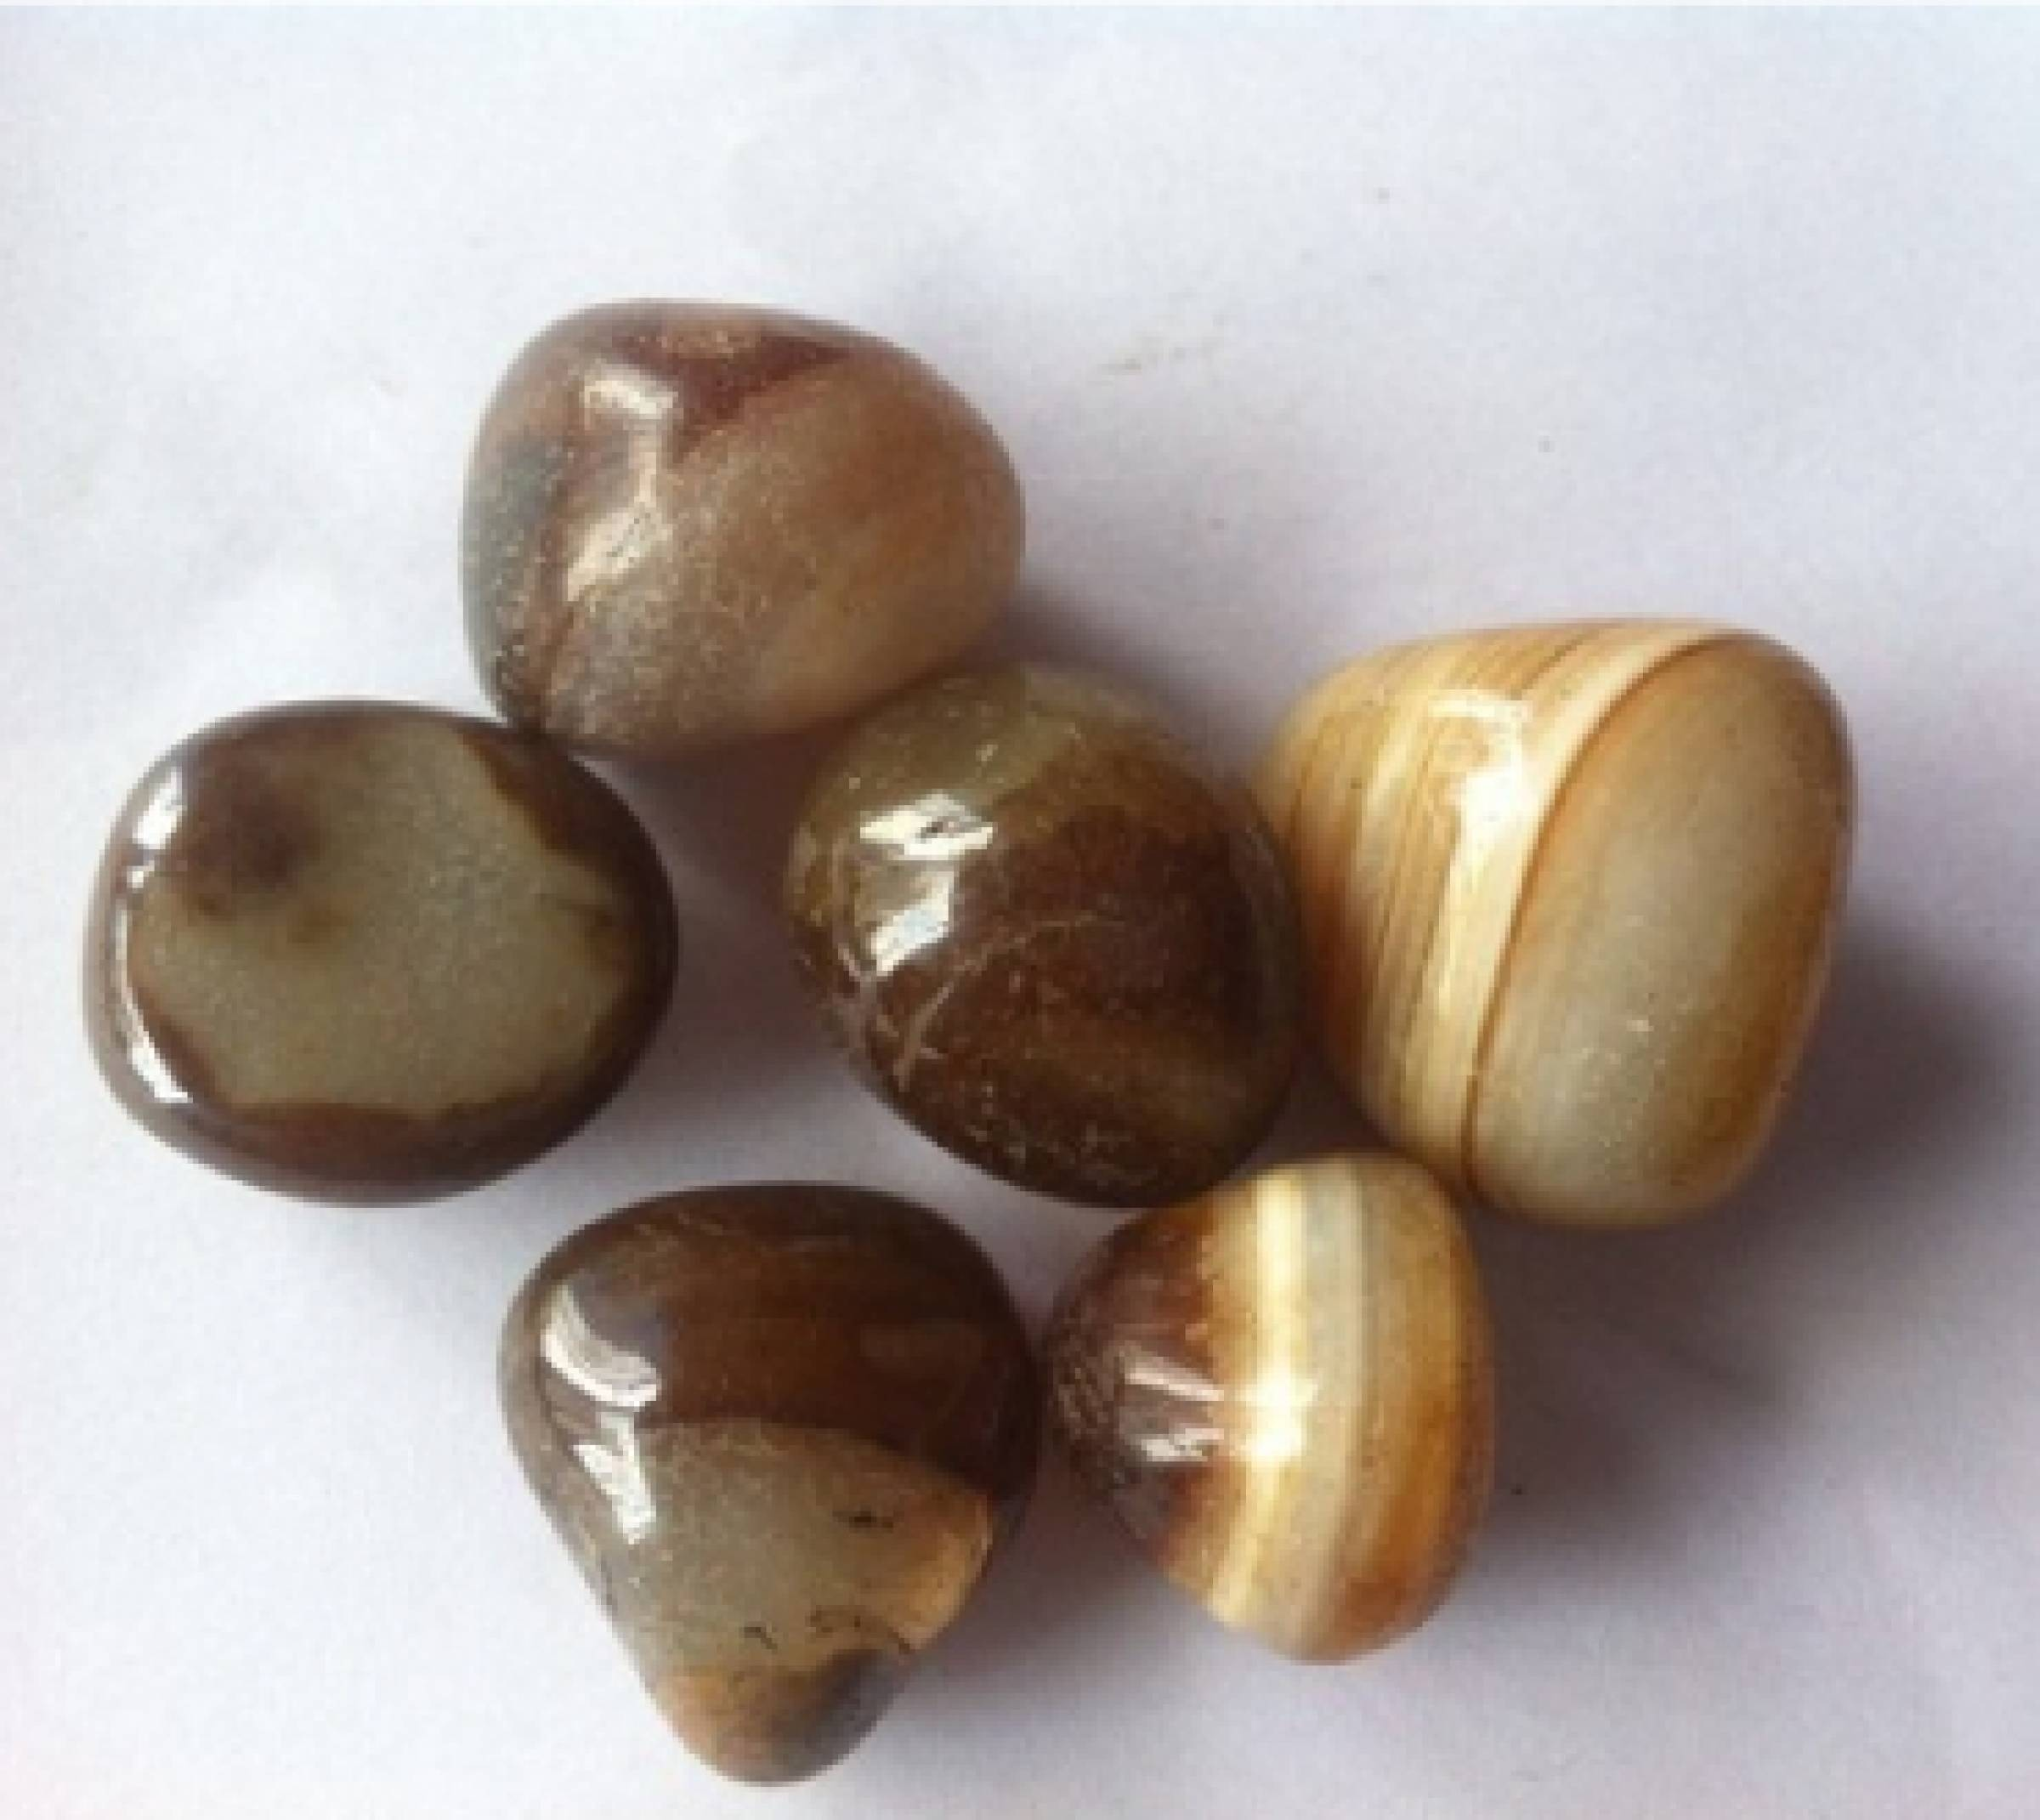 Tumble Stones  (Gemstones) Manufacturer in India- Karnataka Gems